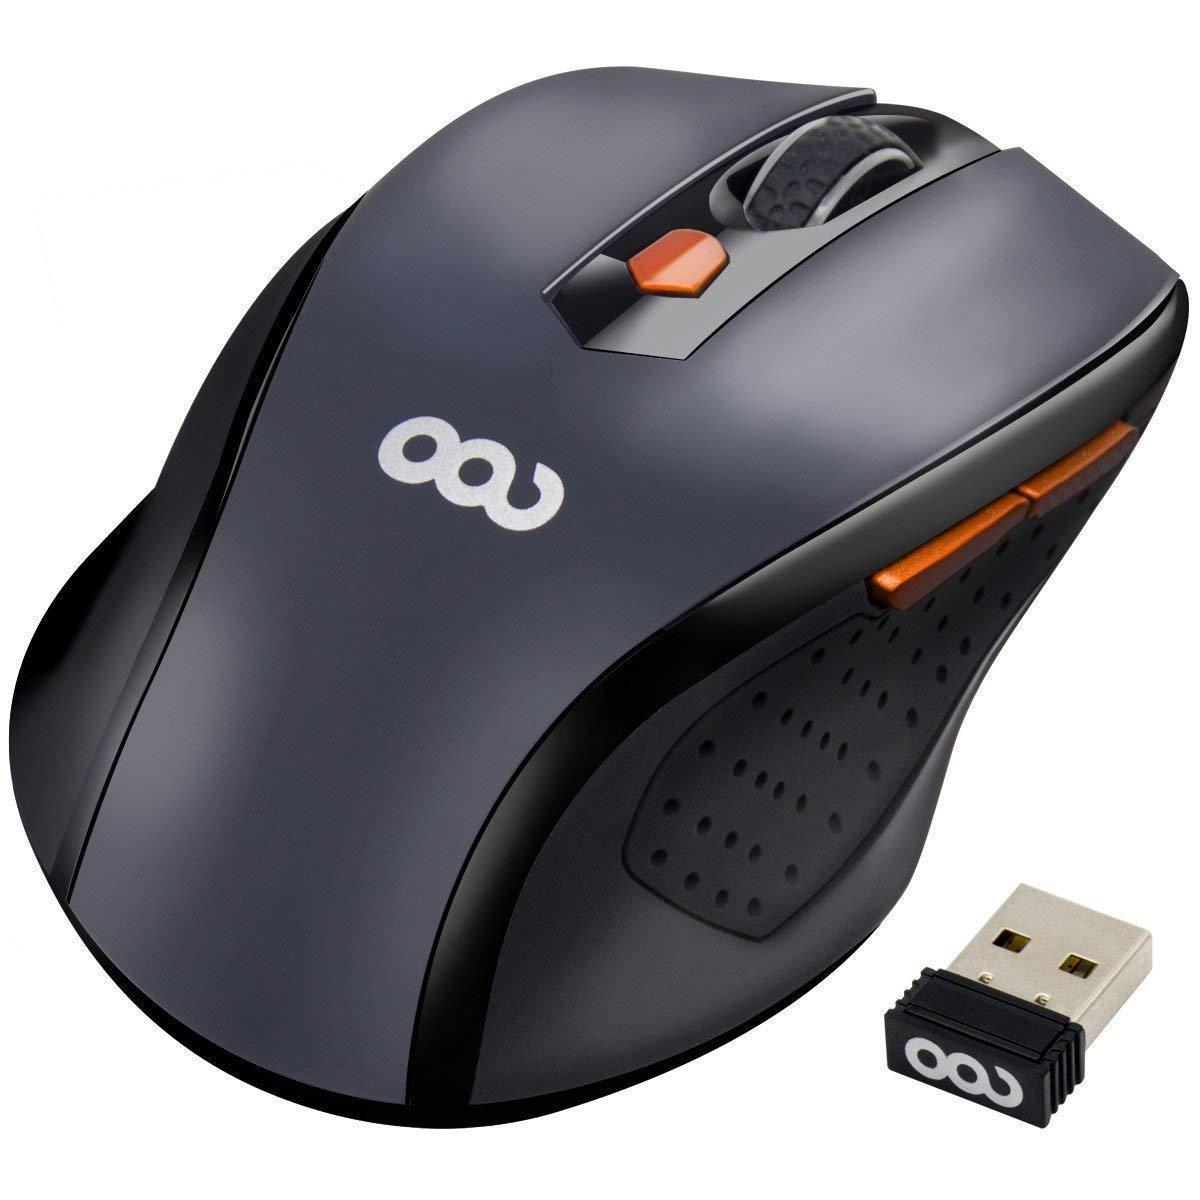 e1c3aae621c Tecknet Pro 2.4g Ergonomic Wireless Mouse   Wireless-mouse